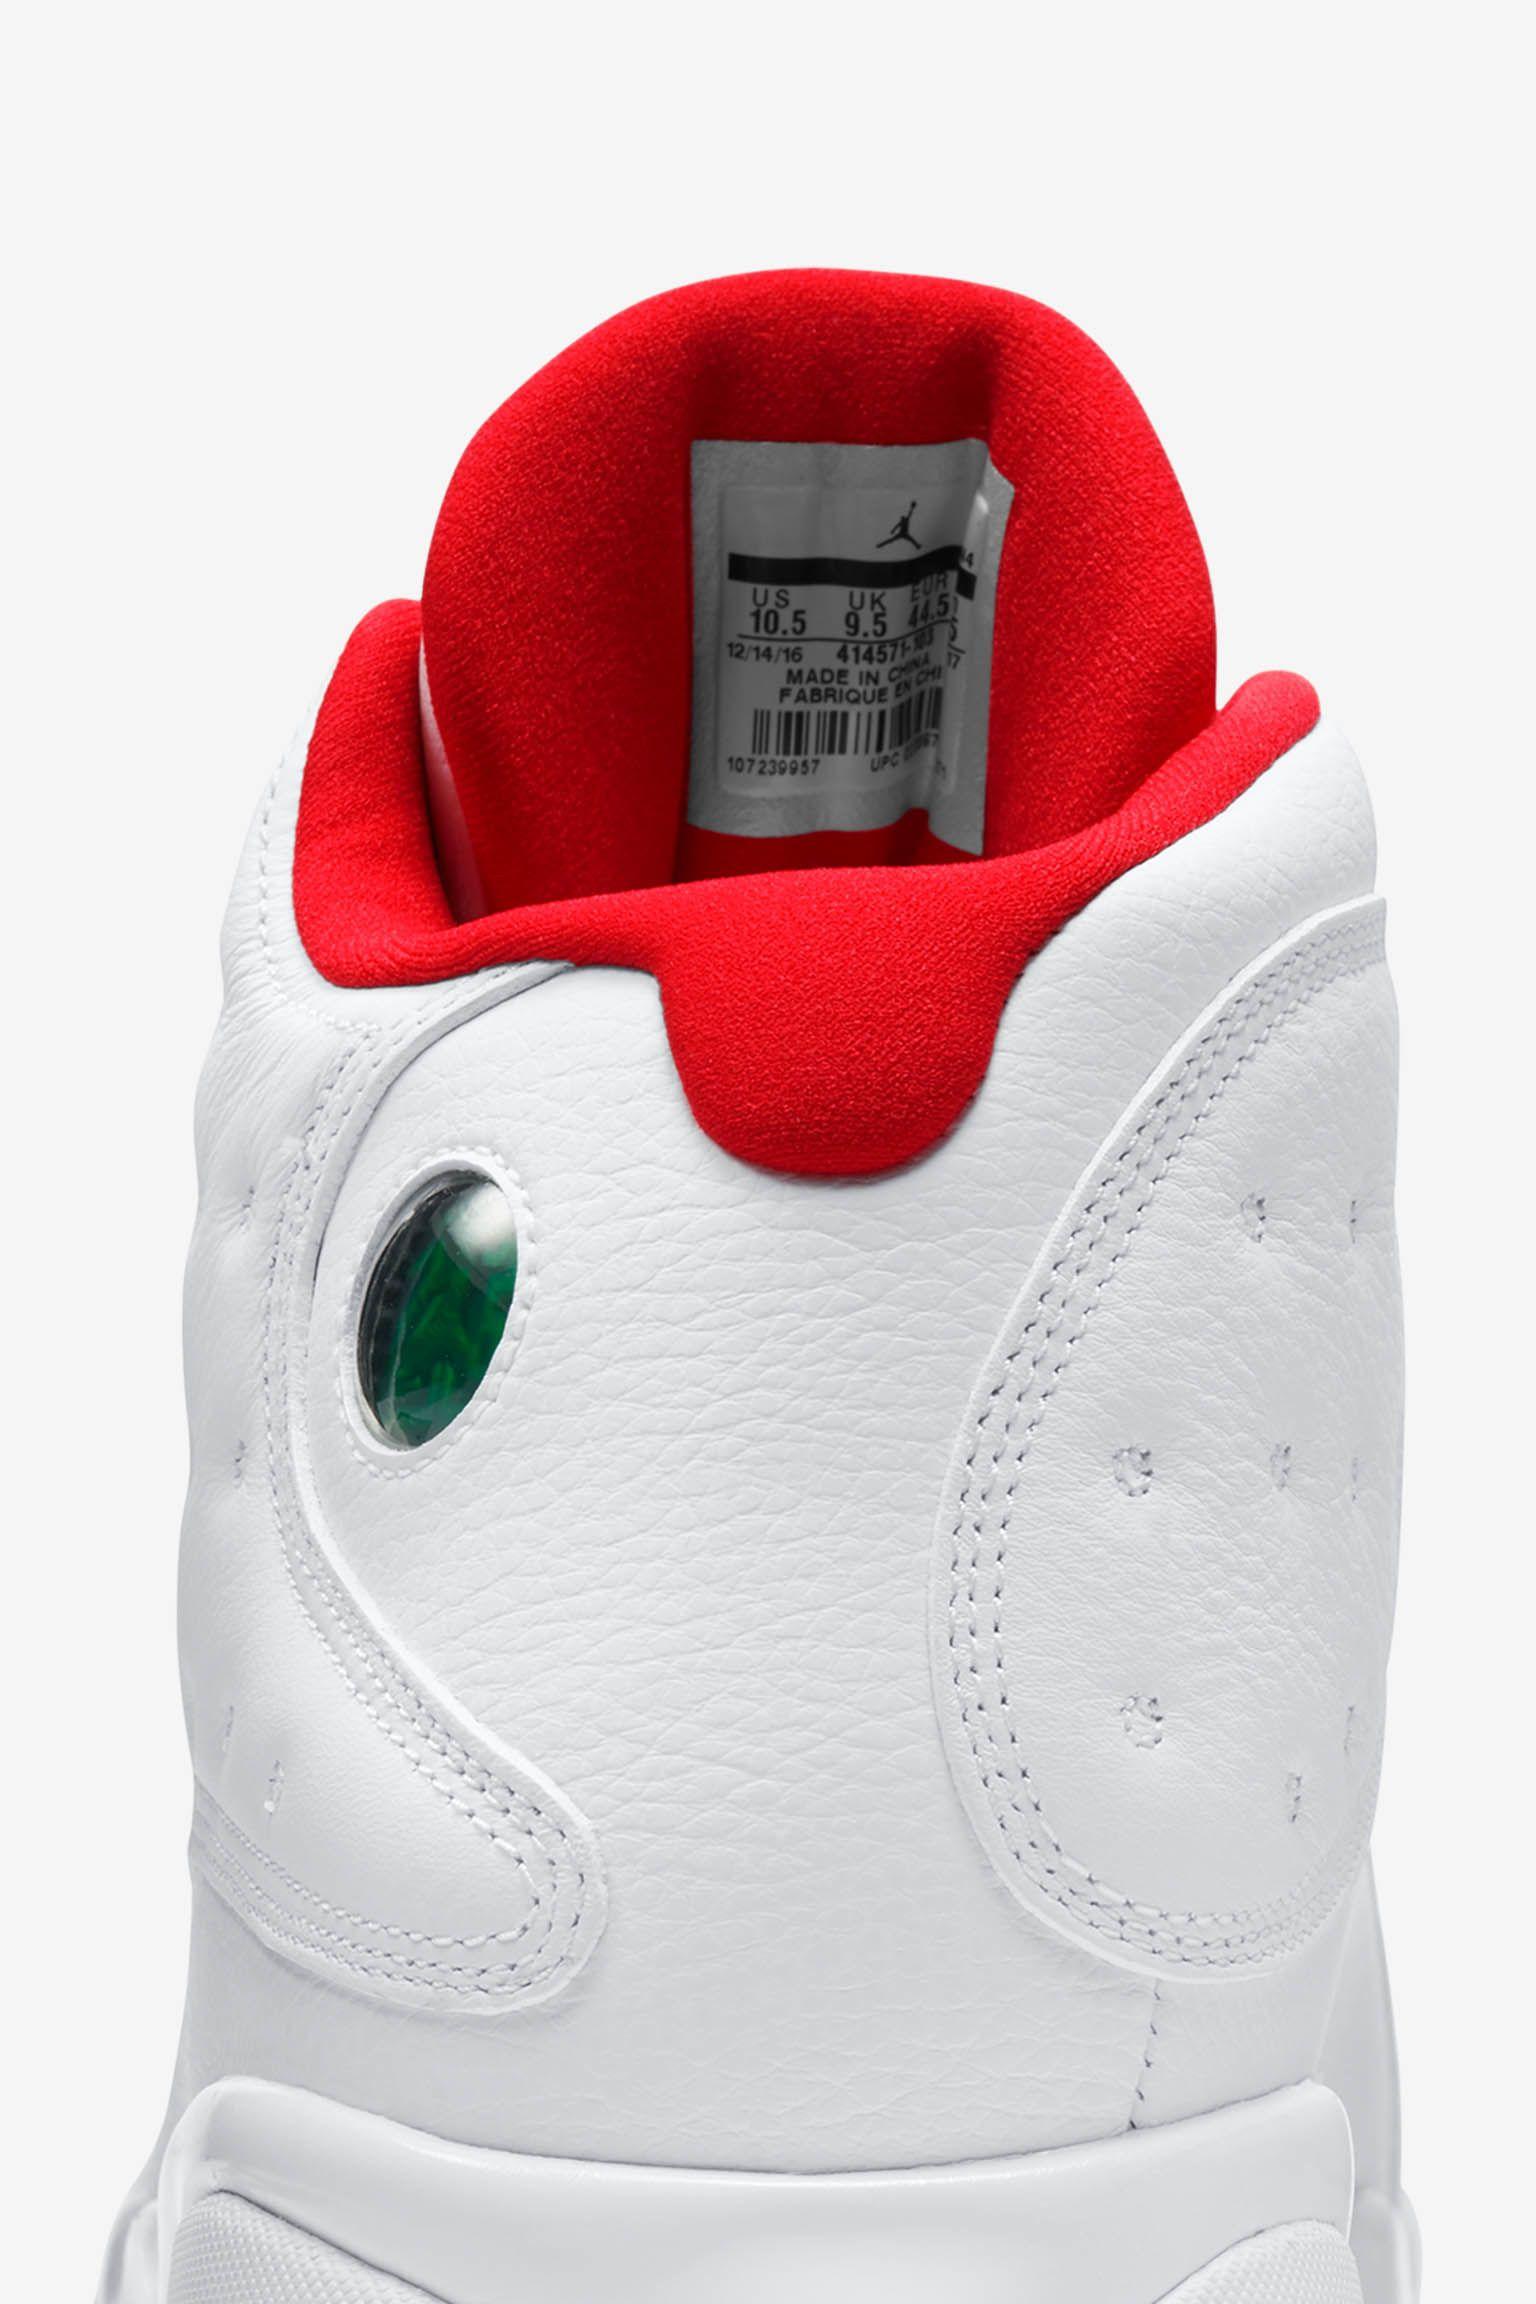 Air Jordan 13 Retro 'History of Flight' Release Date